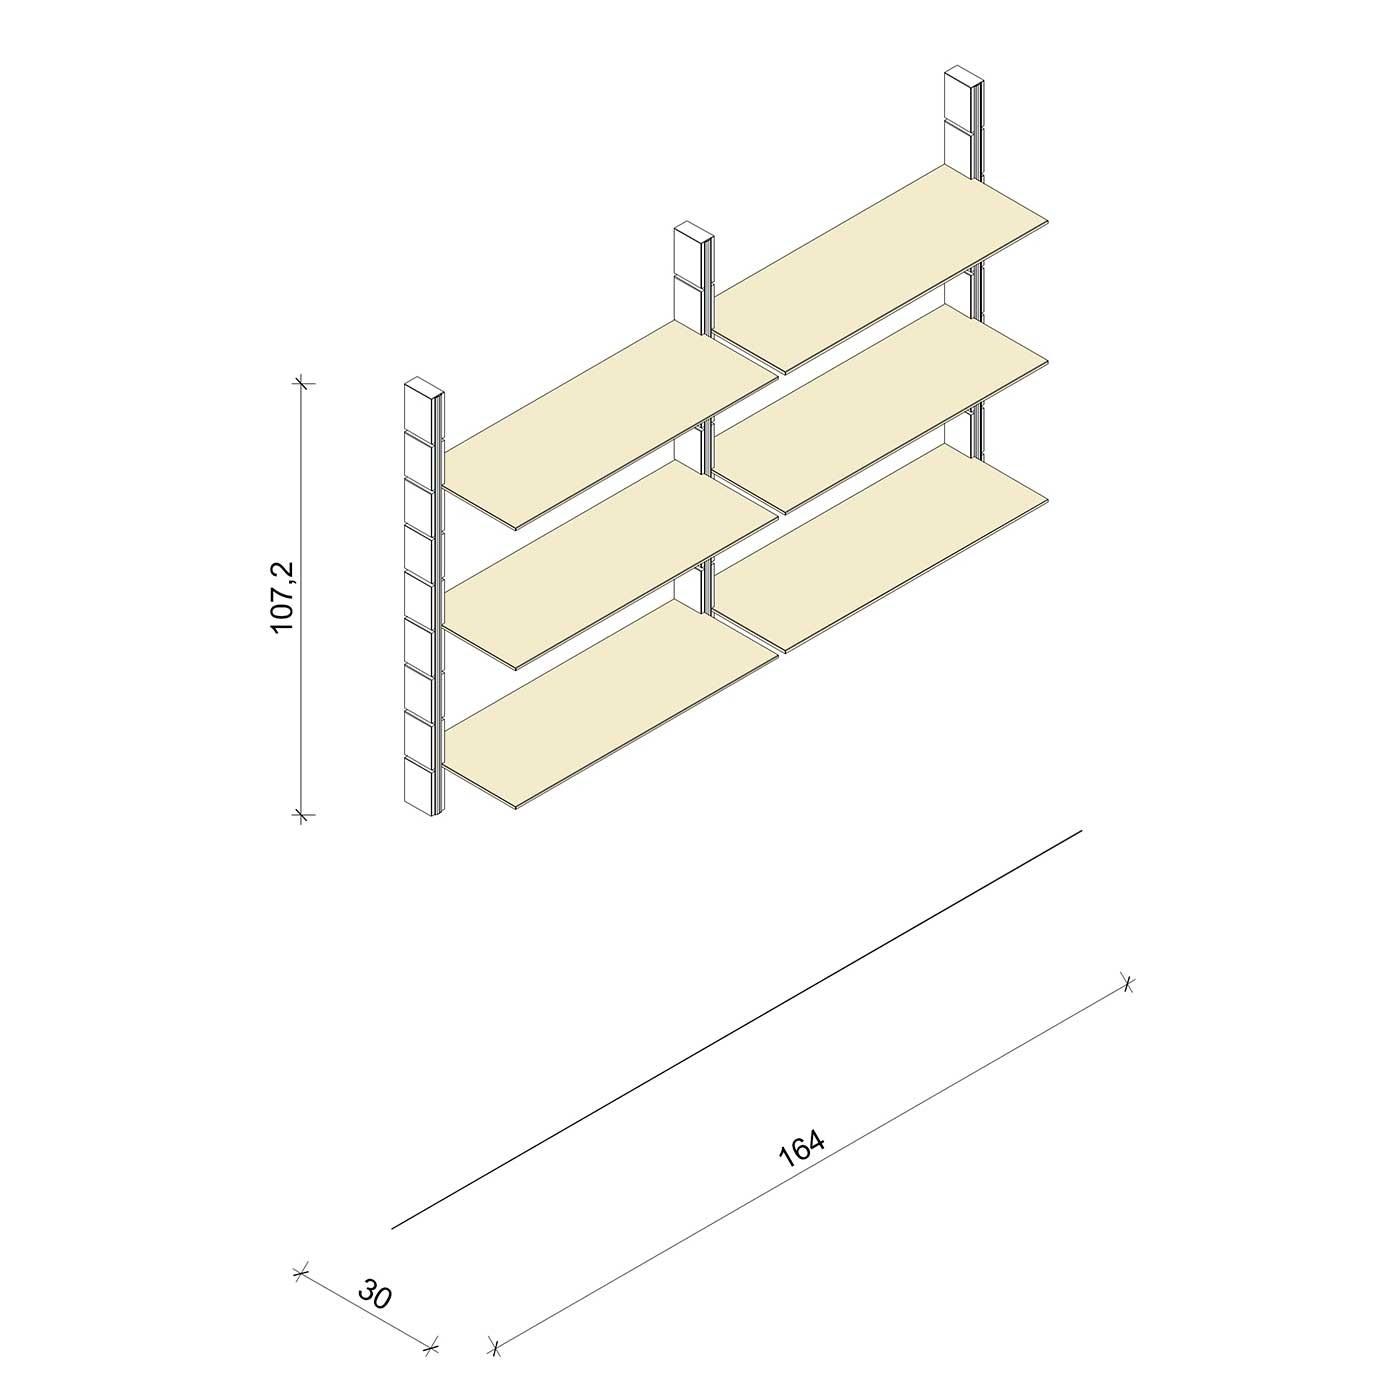 Bücherregal - Prime (M) 164 - Maß: 164 x 107,2 x 30 cm (B x H x T)